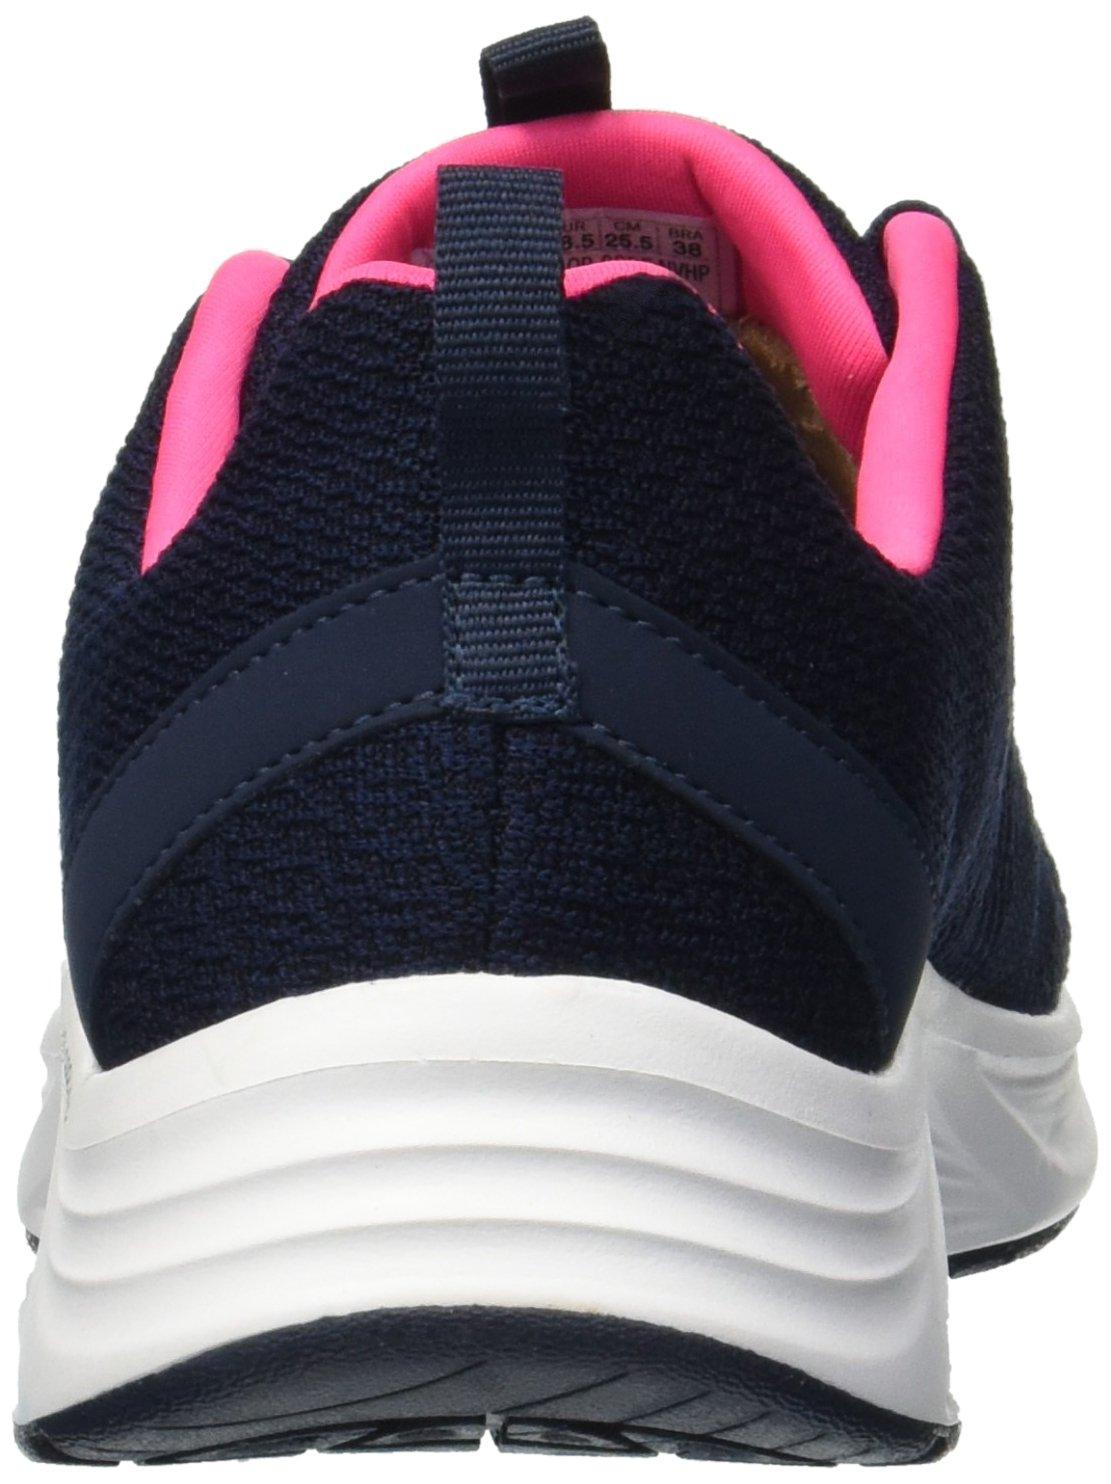 Skechers Women's B(M) Skyline Sneaker B078W84GNX 5.5 B(M) Women's US|Navy Pink/Navy Pink 9d4079